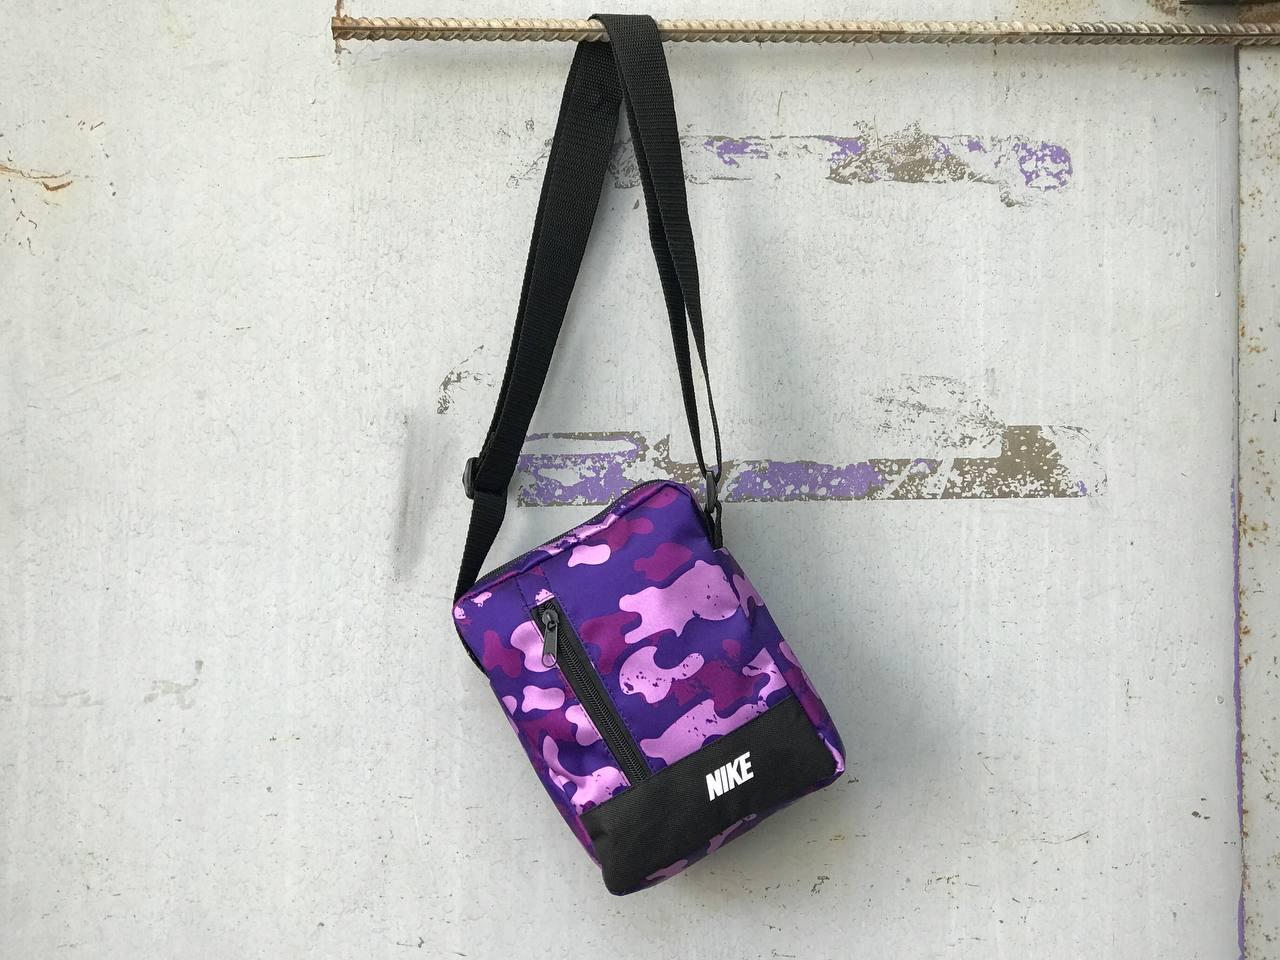 Сумка через плечо Nike фиолетовая